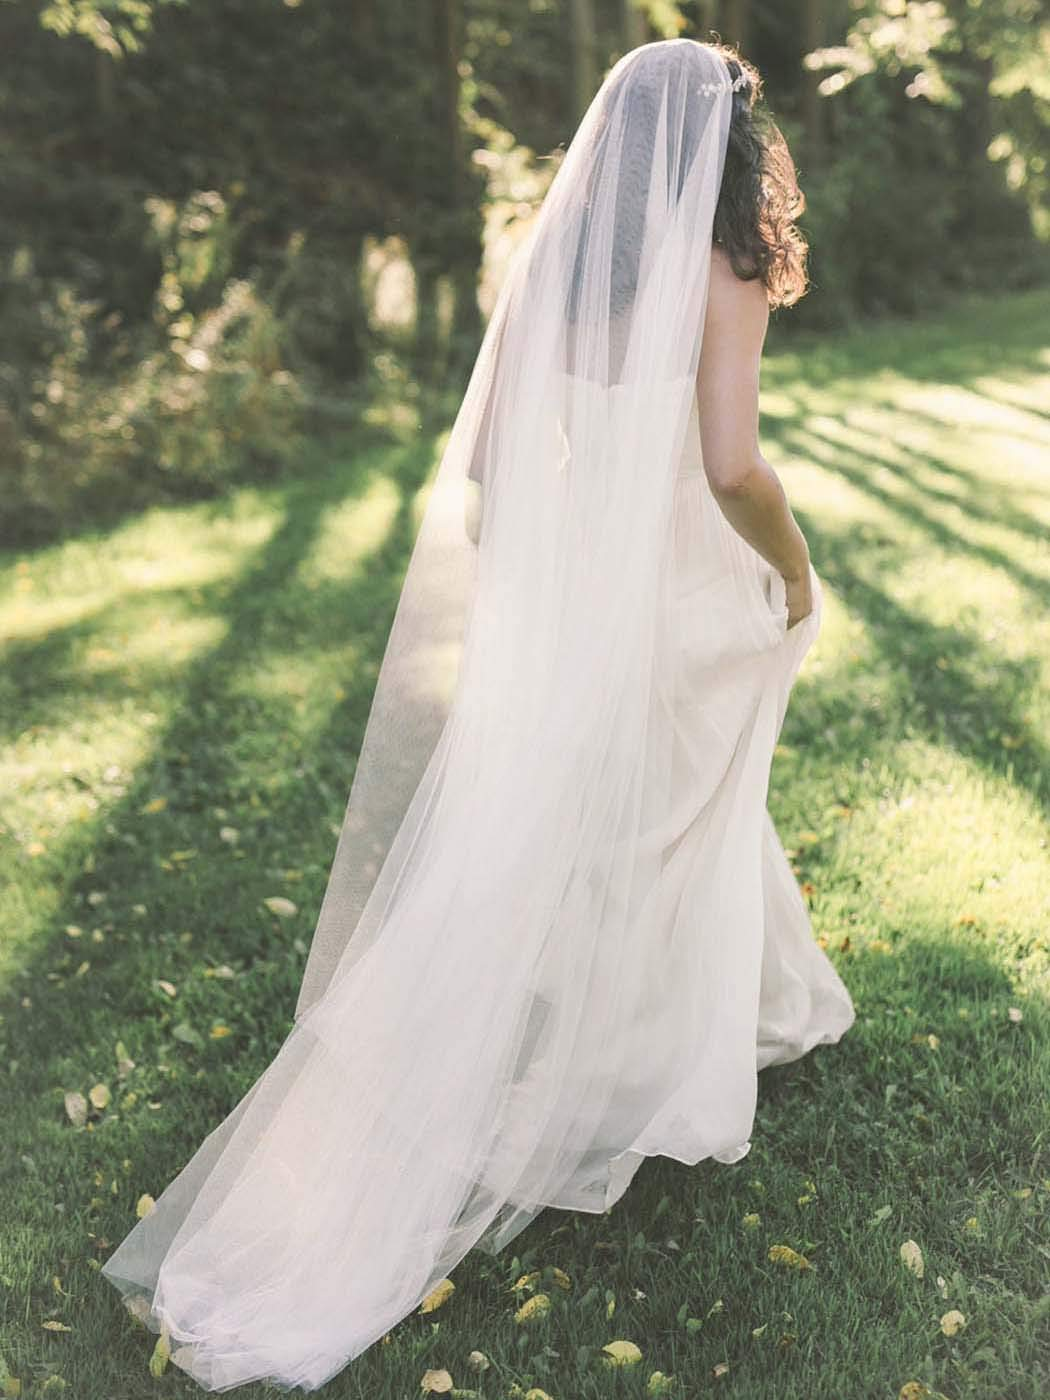 Ivory Wedding Veil \u2022 Ivory Lace Wedding Veil \u2022 Lace Around Train Veil \u2022 Floor Length Veil \u2022 Chapel Length Veil \u2022 Cathedral Length Veil